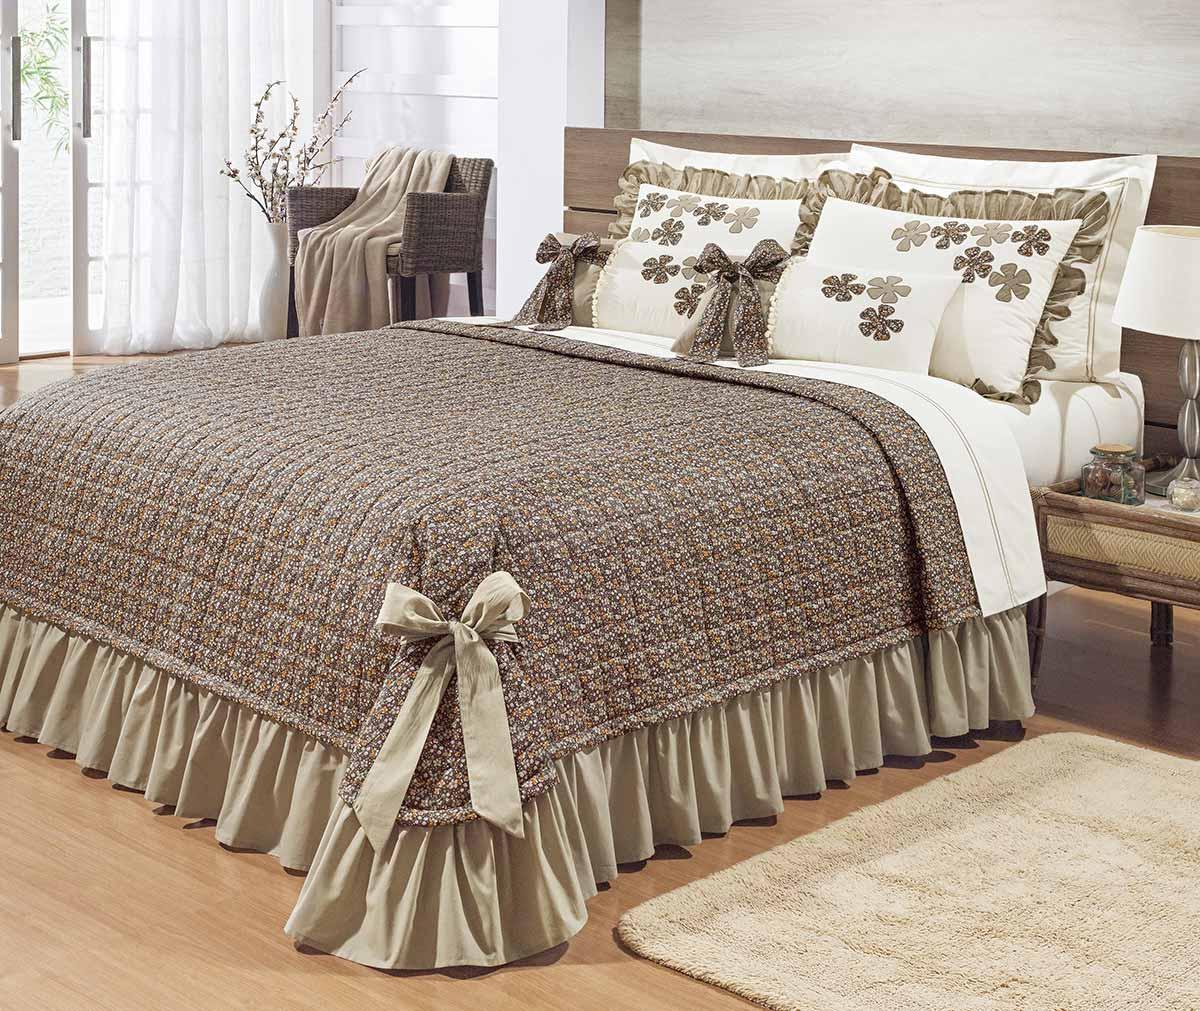 Kit colcha colcha jogo de len ol king kit doce lar 150 - Colchas para camas de 150 ...